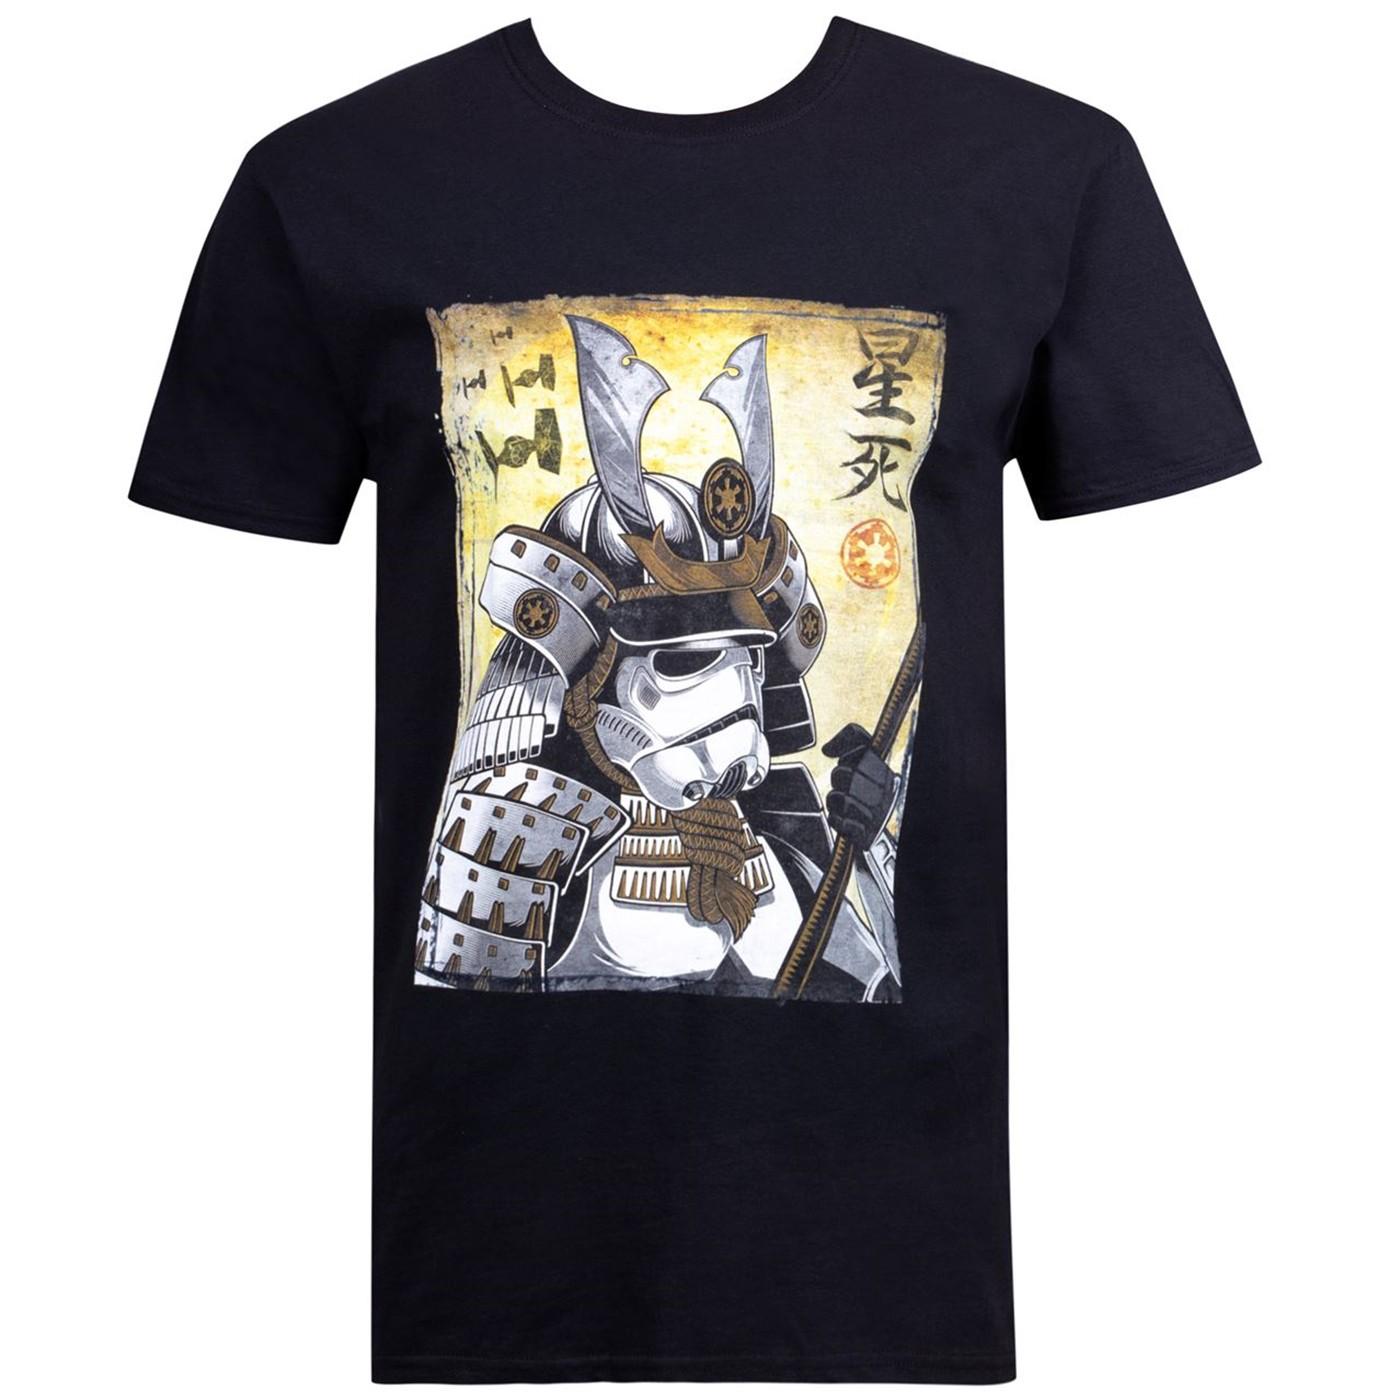 Star Wars Samurai Stormtrooper Black Men's T-Shirt